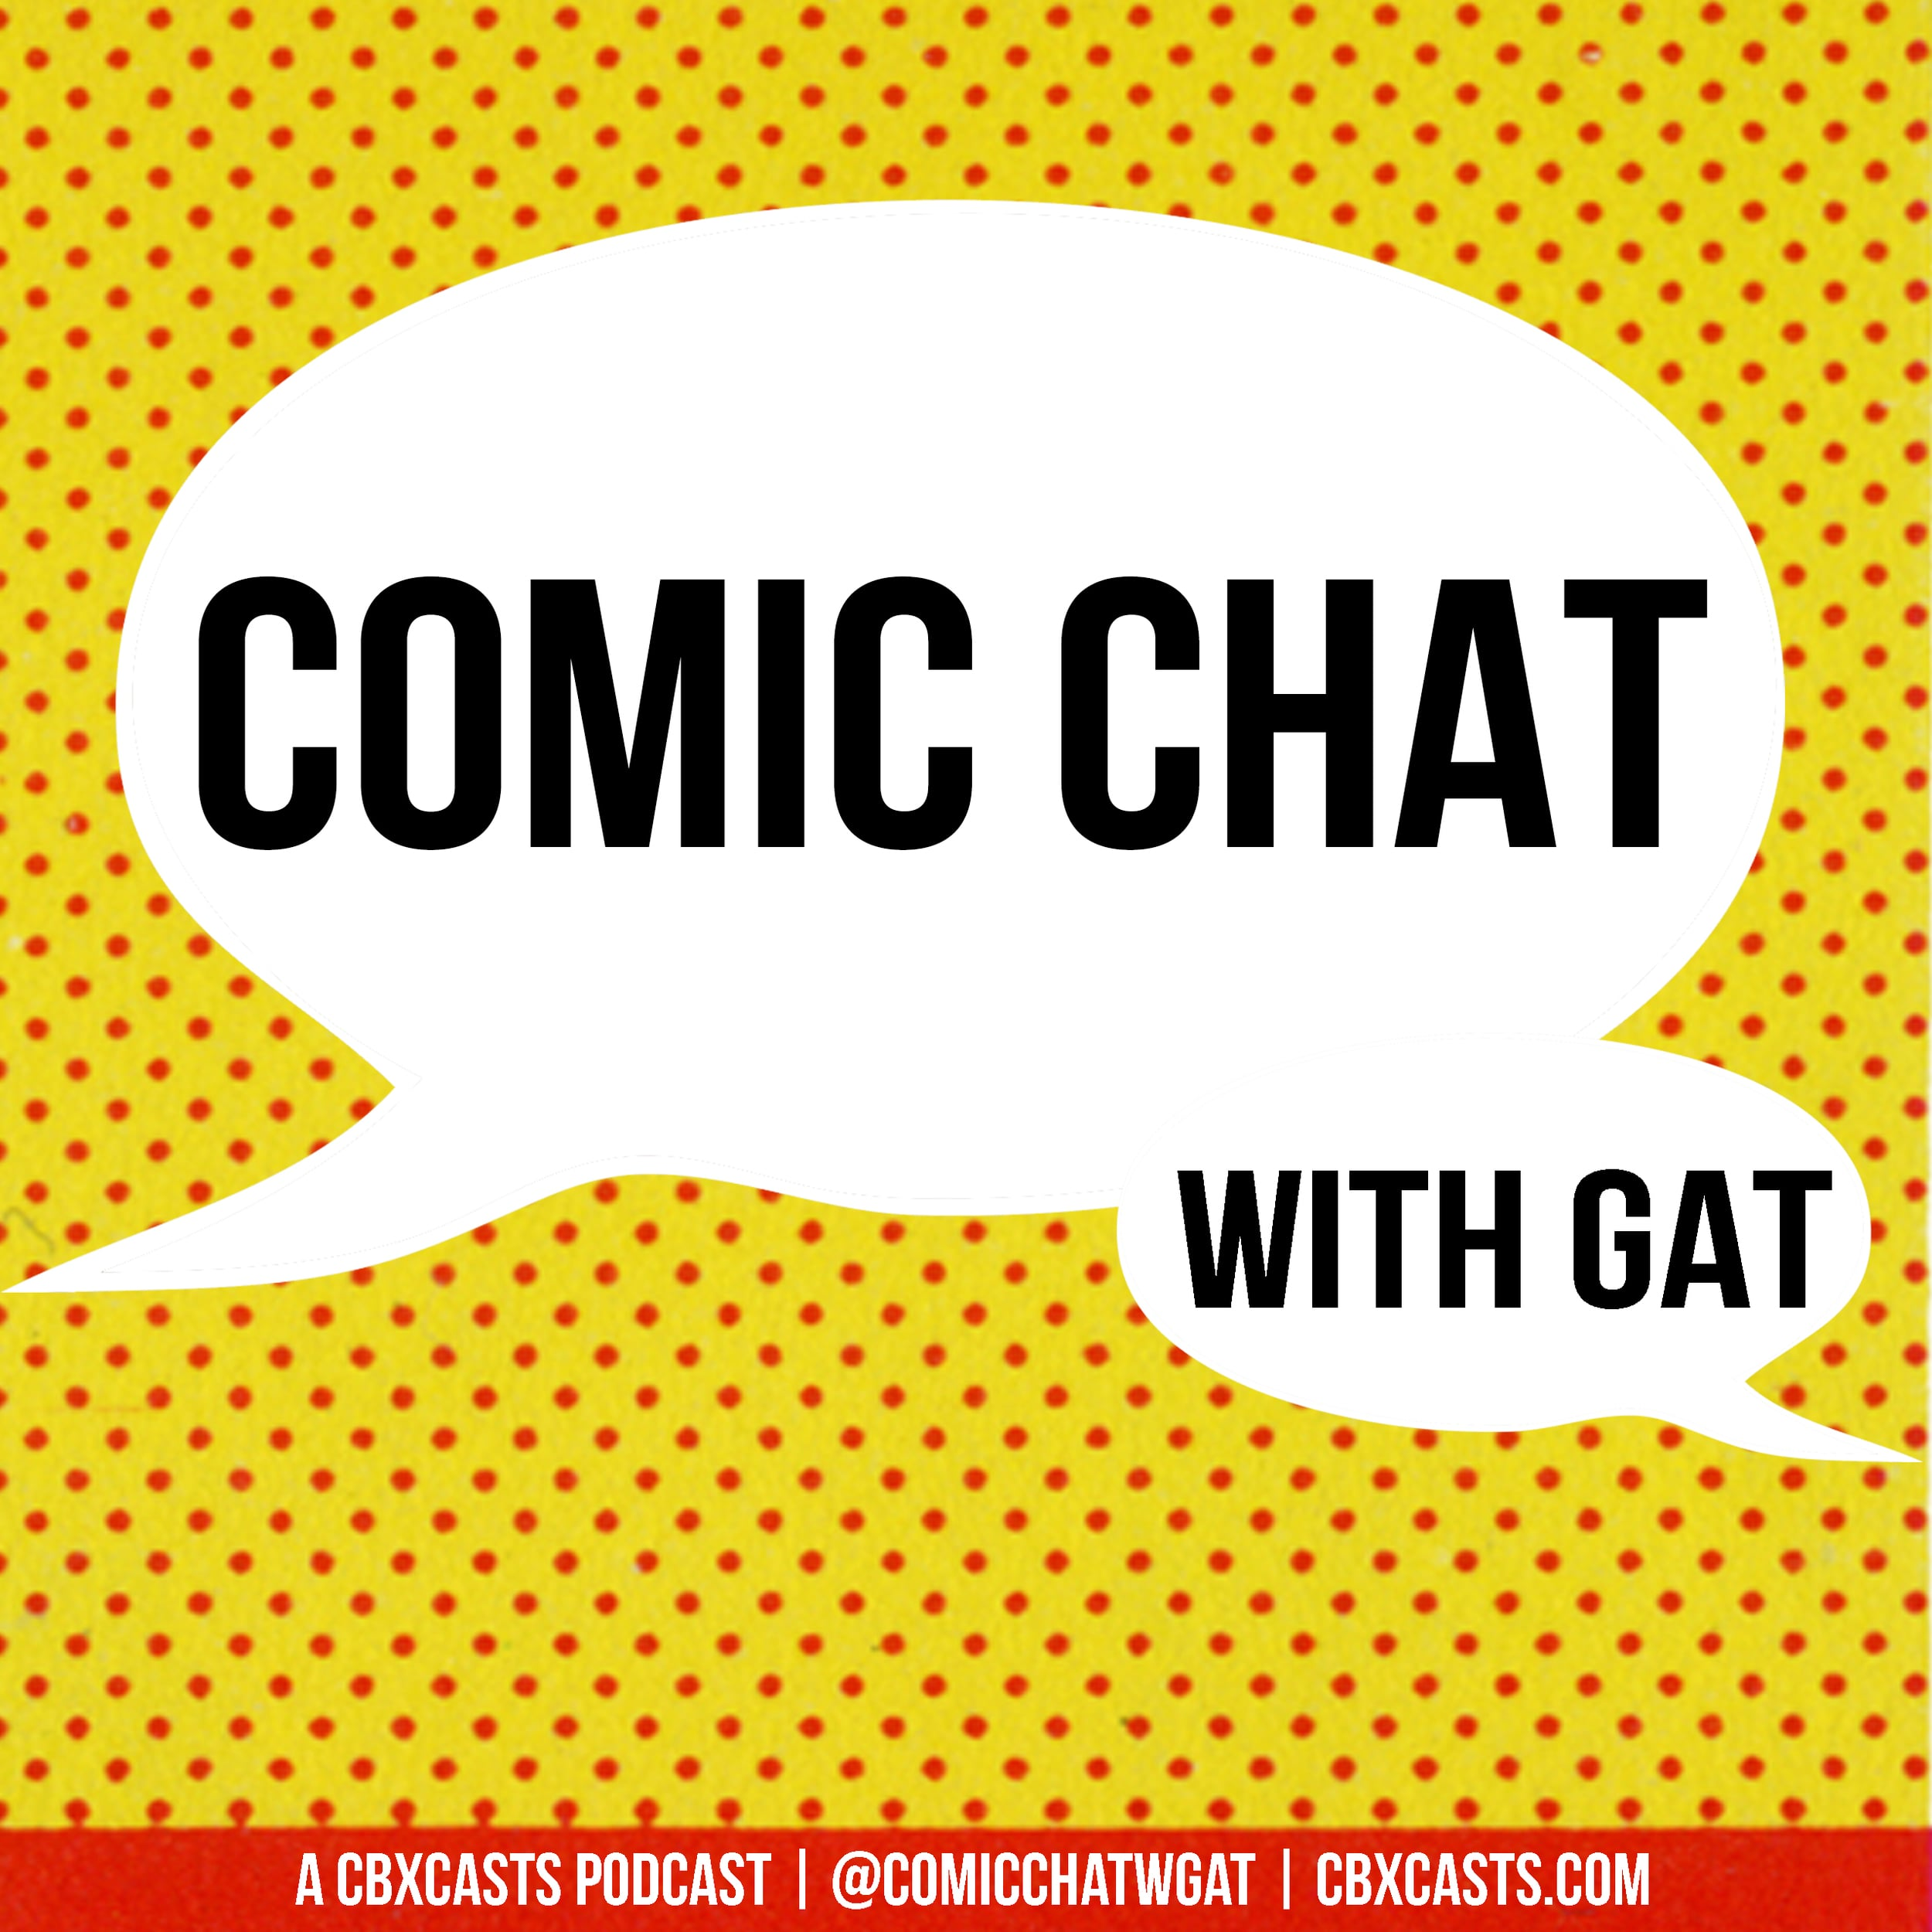 Comic Chat With Gat Logo.jpg